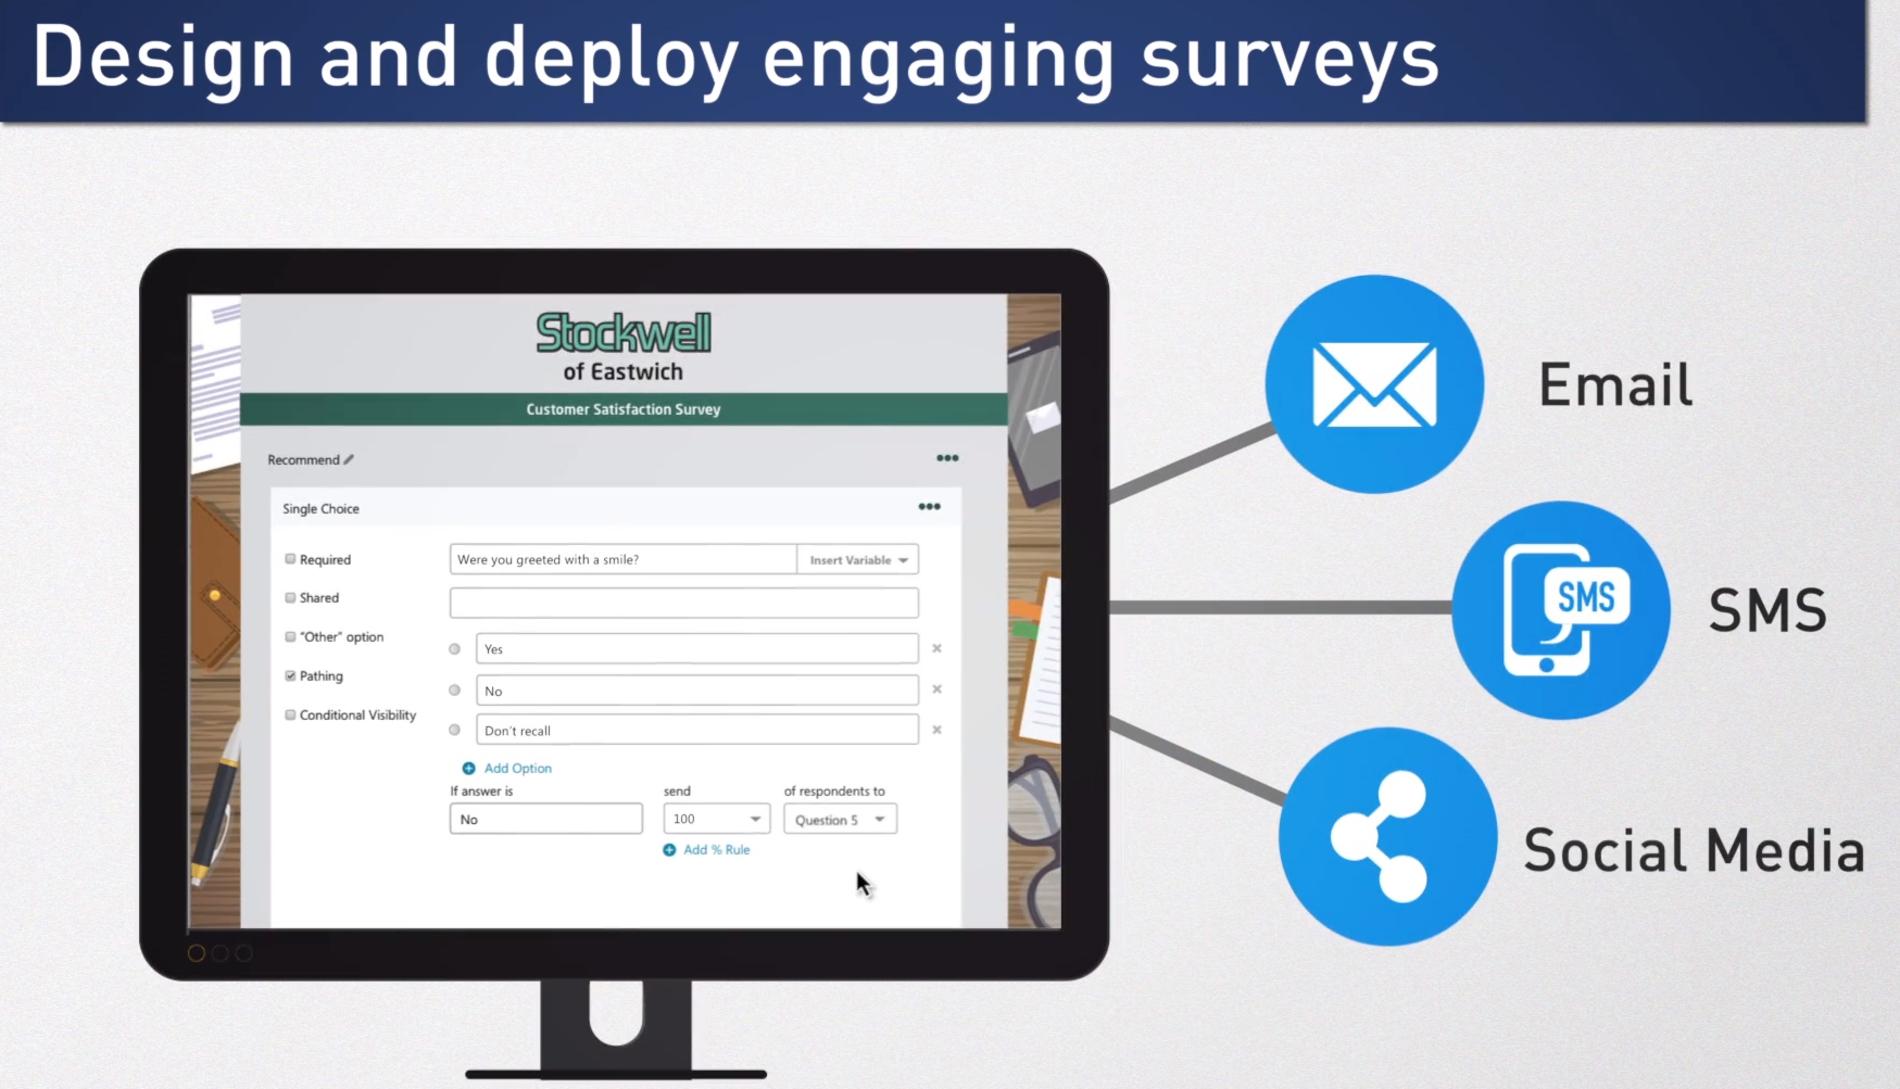 Design and deploy engaging surveys